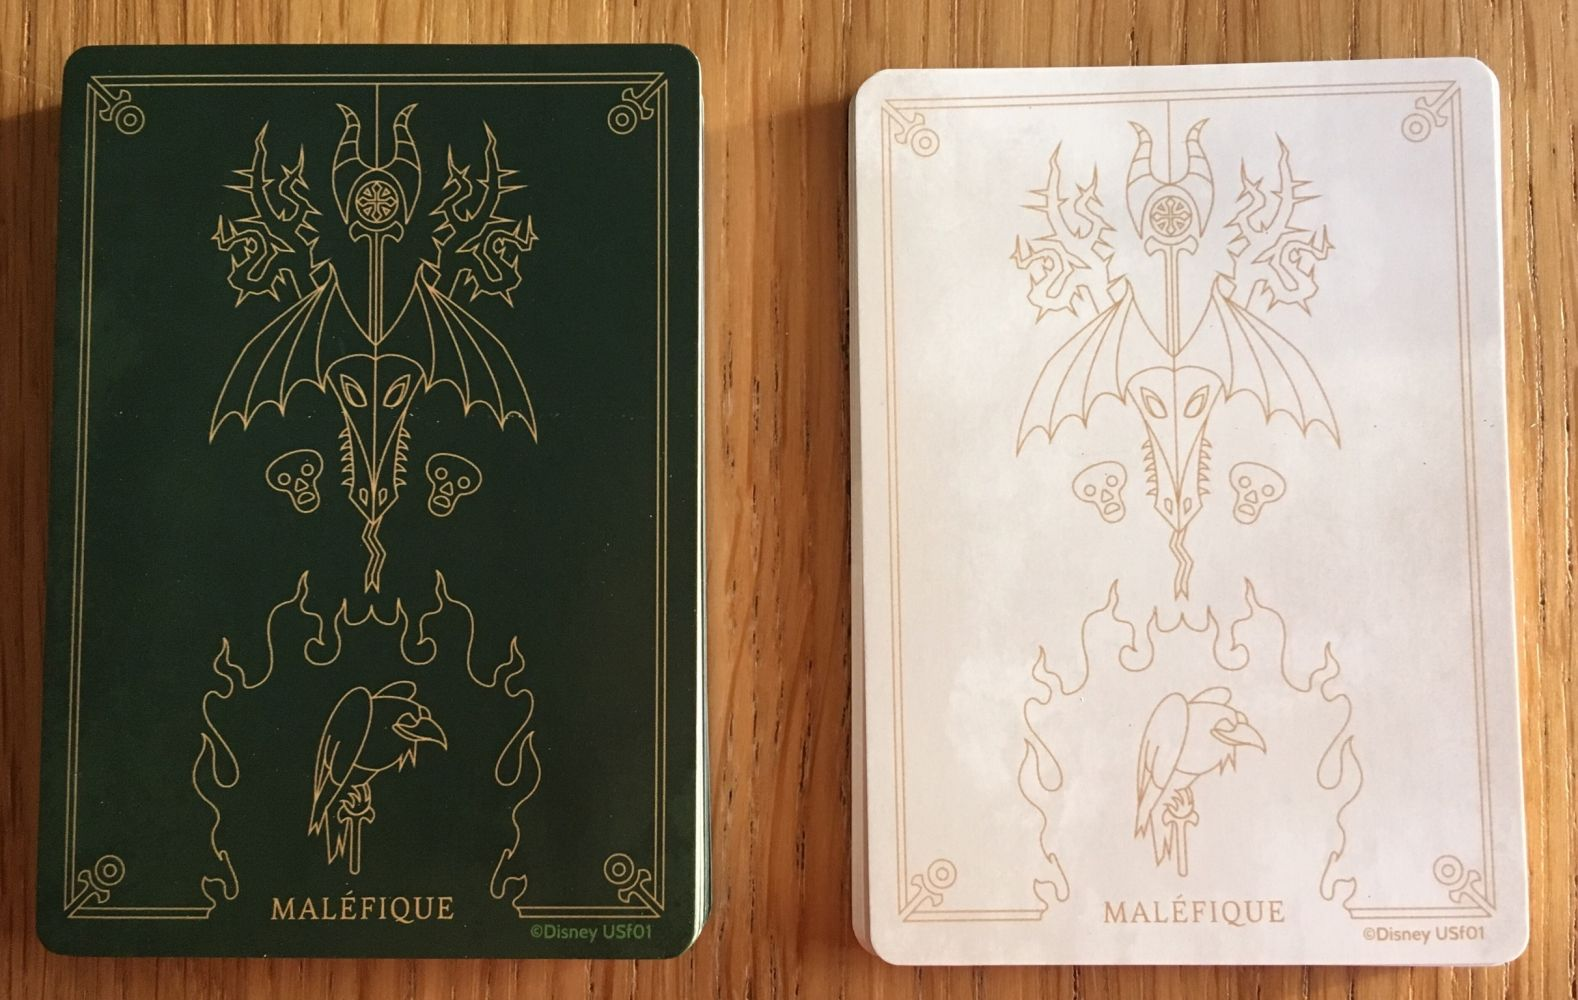 Les decks de cartes de Maléfique